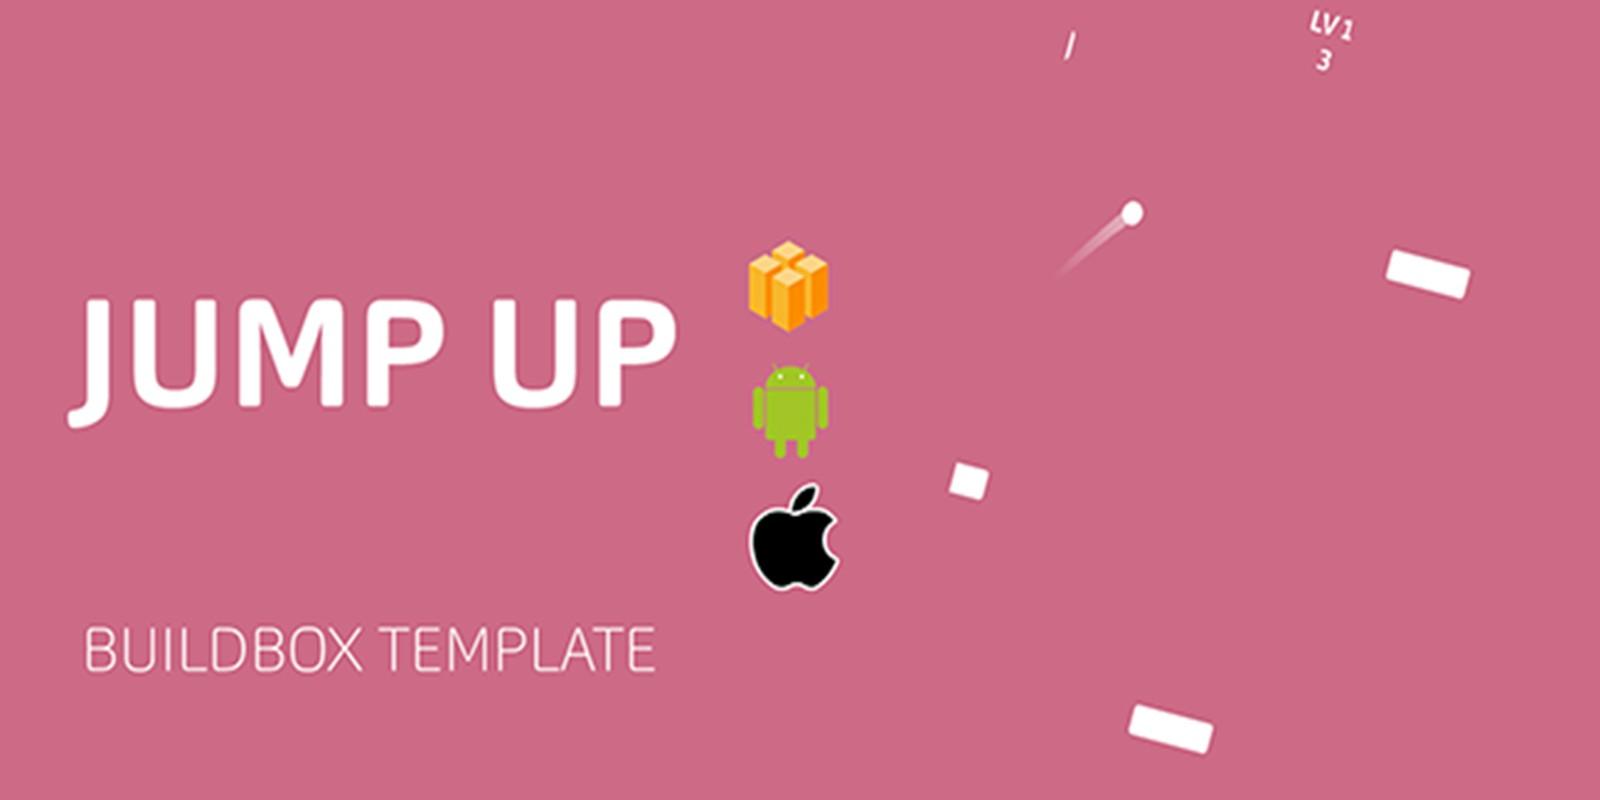 Jump Up Buildbox Template